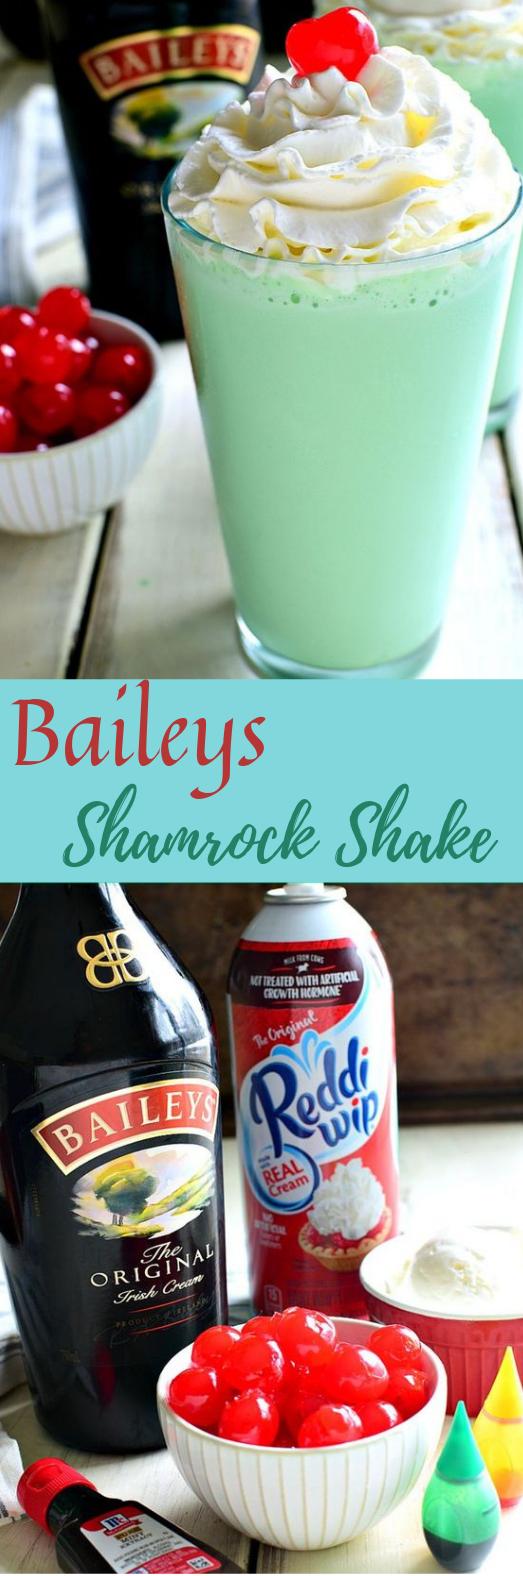 BAILEYS SHAMROCK SHAKE #healthydrink #yummy